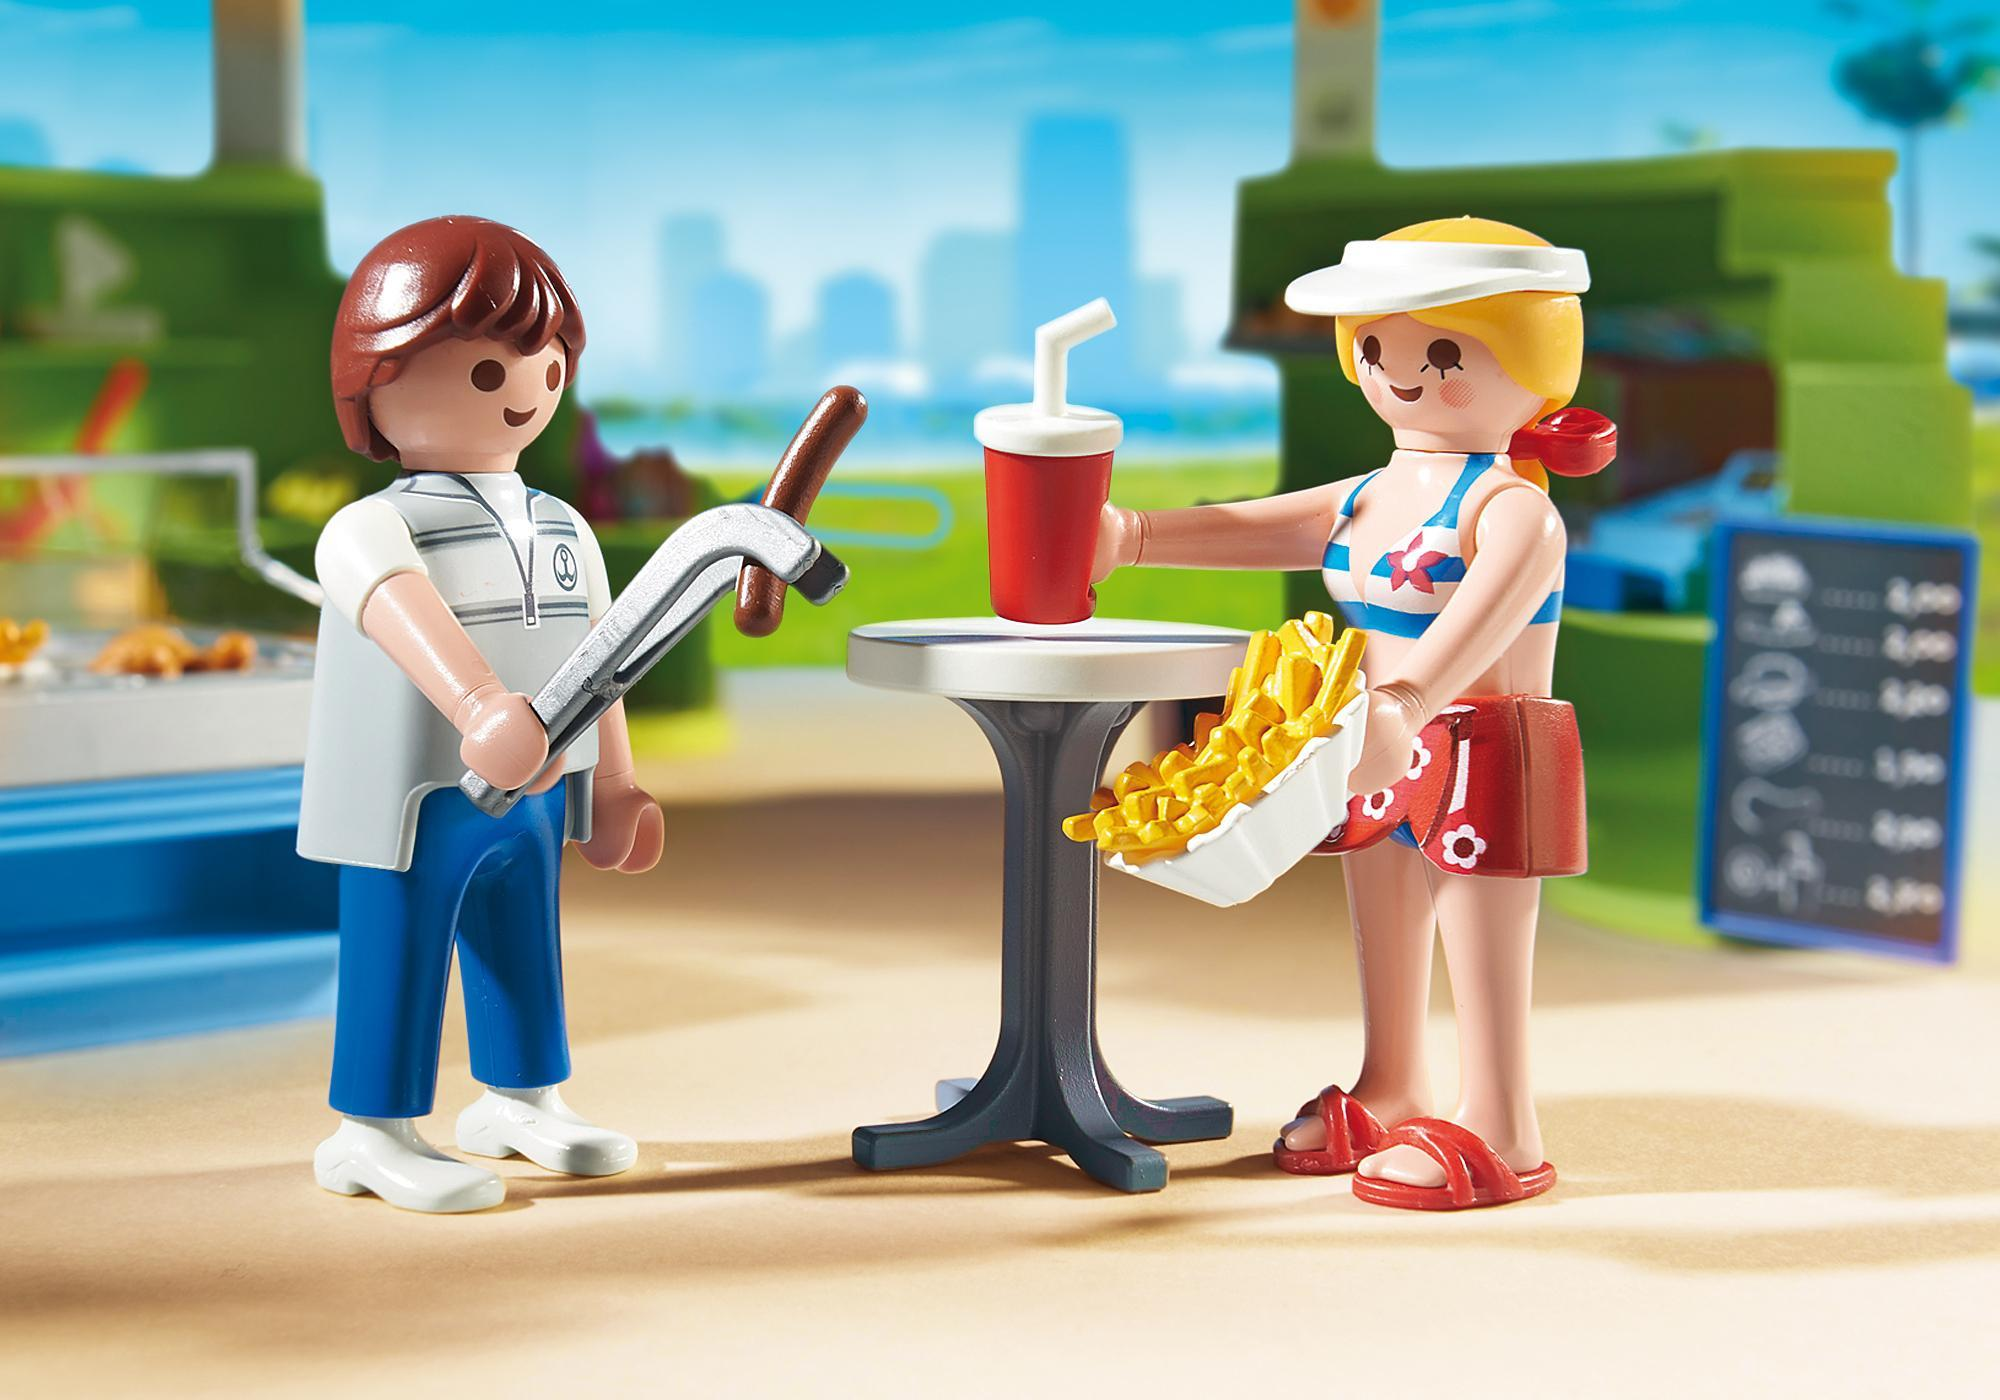 http://media.playmobil.com/i/playmobil/6672_product_extra3/Espace boutique et fast-food